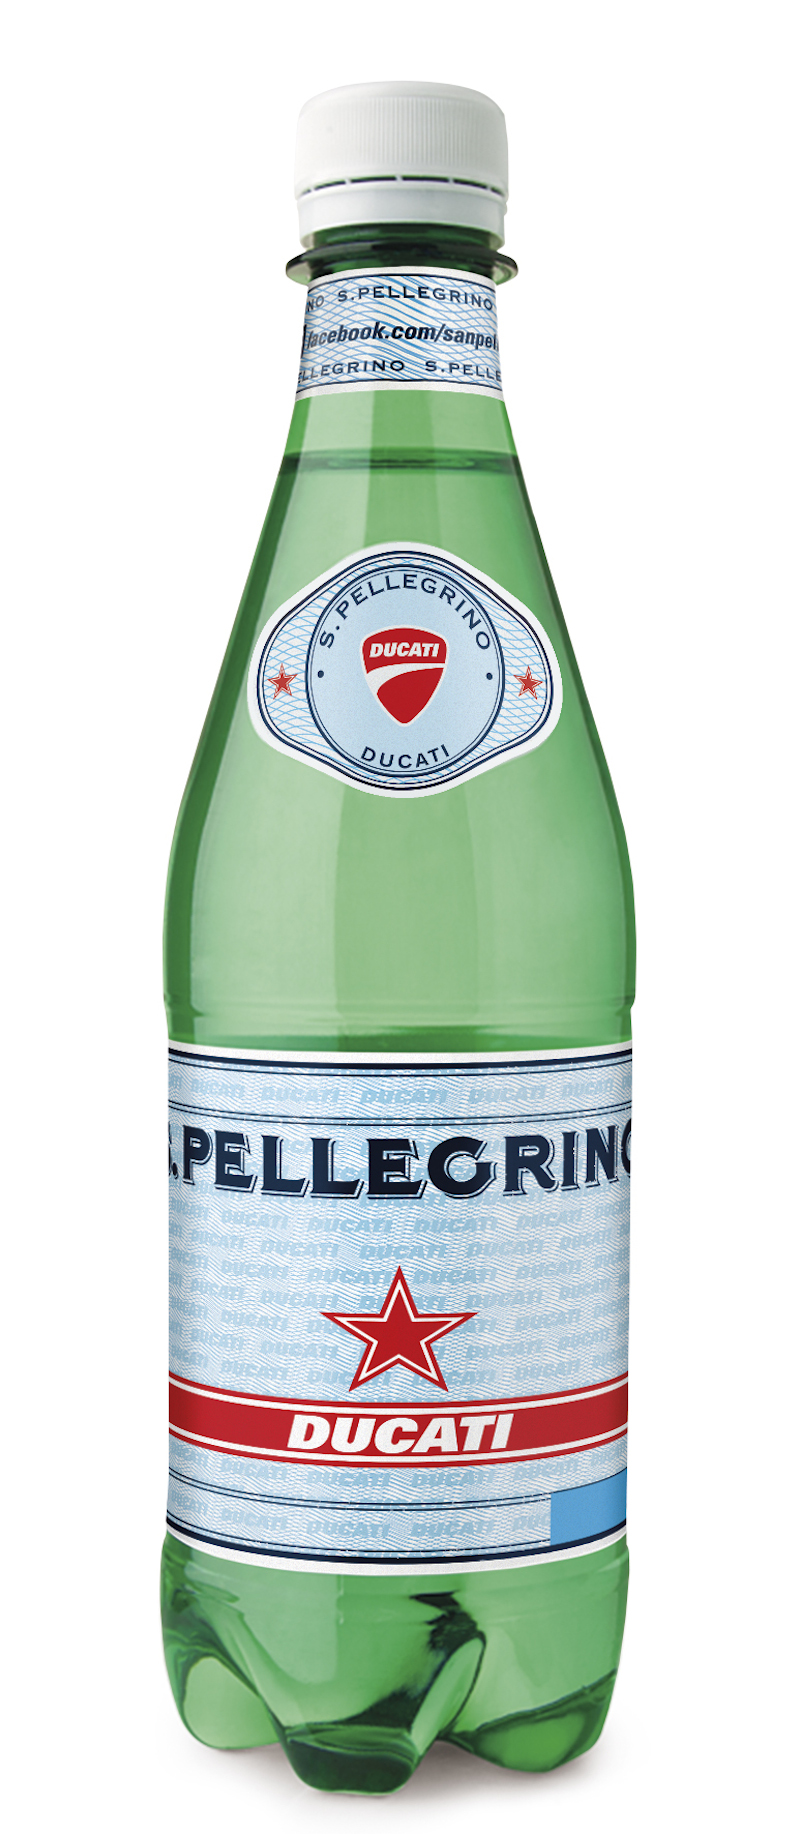 S.Pellegrino Ducati butelka